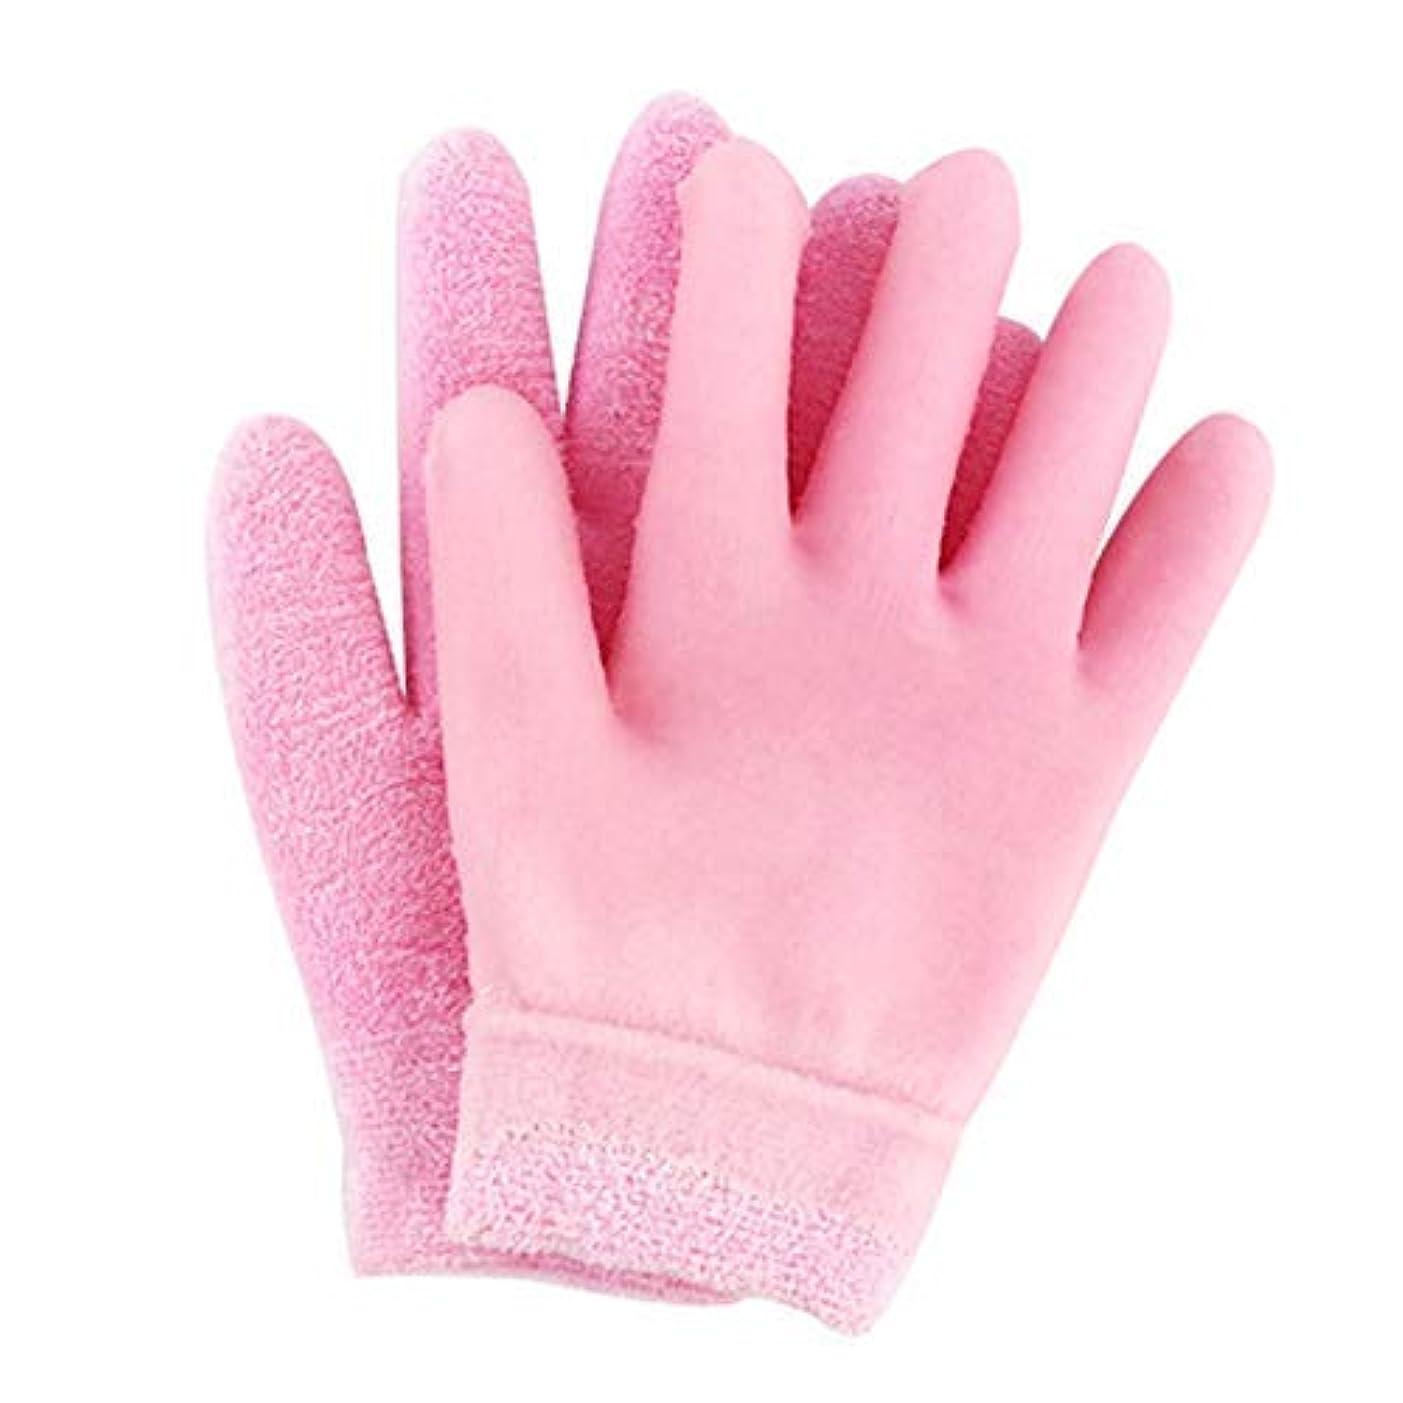 Simg 美容 保湿 手袋 ハイドロ ジェル グローブ 手荒れ対策 フリーサイズ